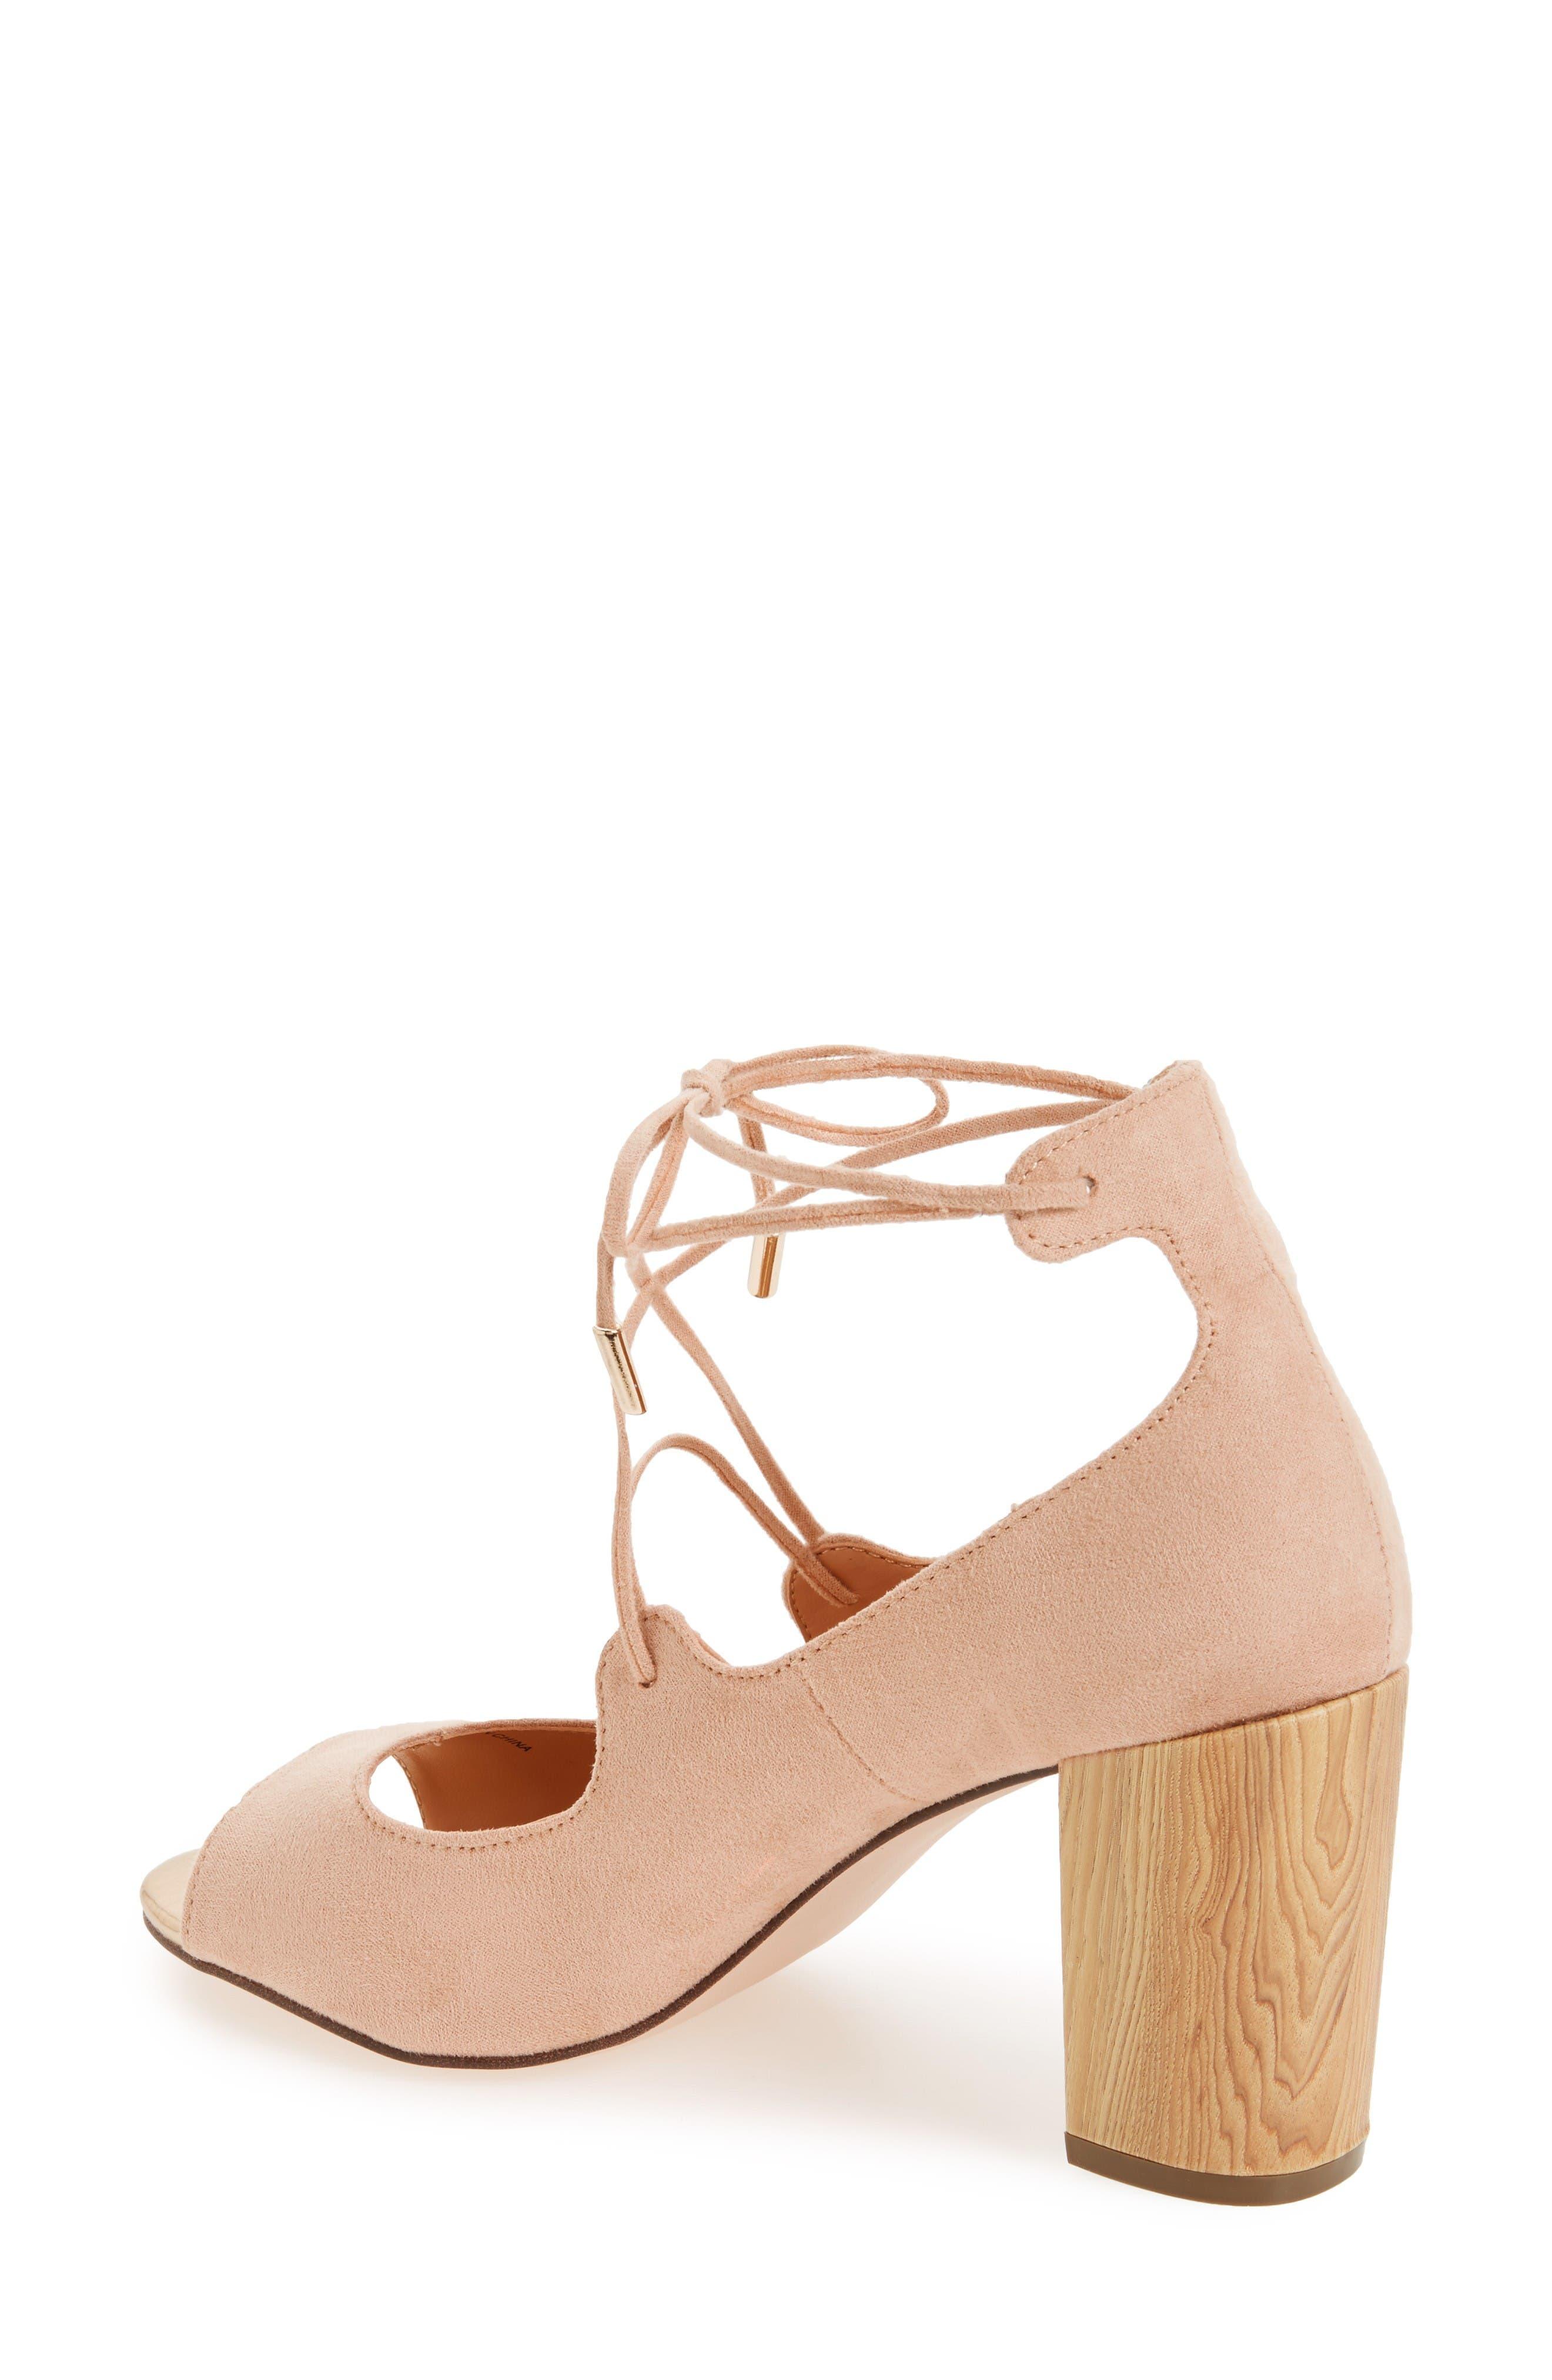 Vikki Block Heel Sandal,                             Alternate thumbnail 2, color,                             Nude Faux Suede